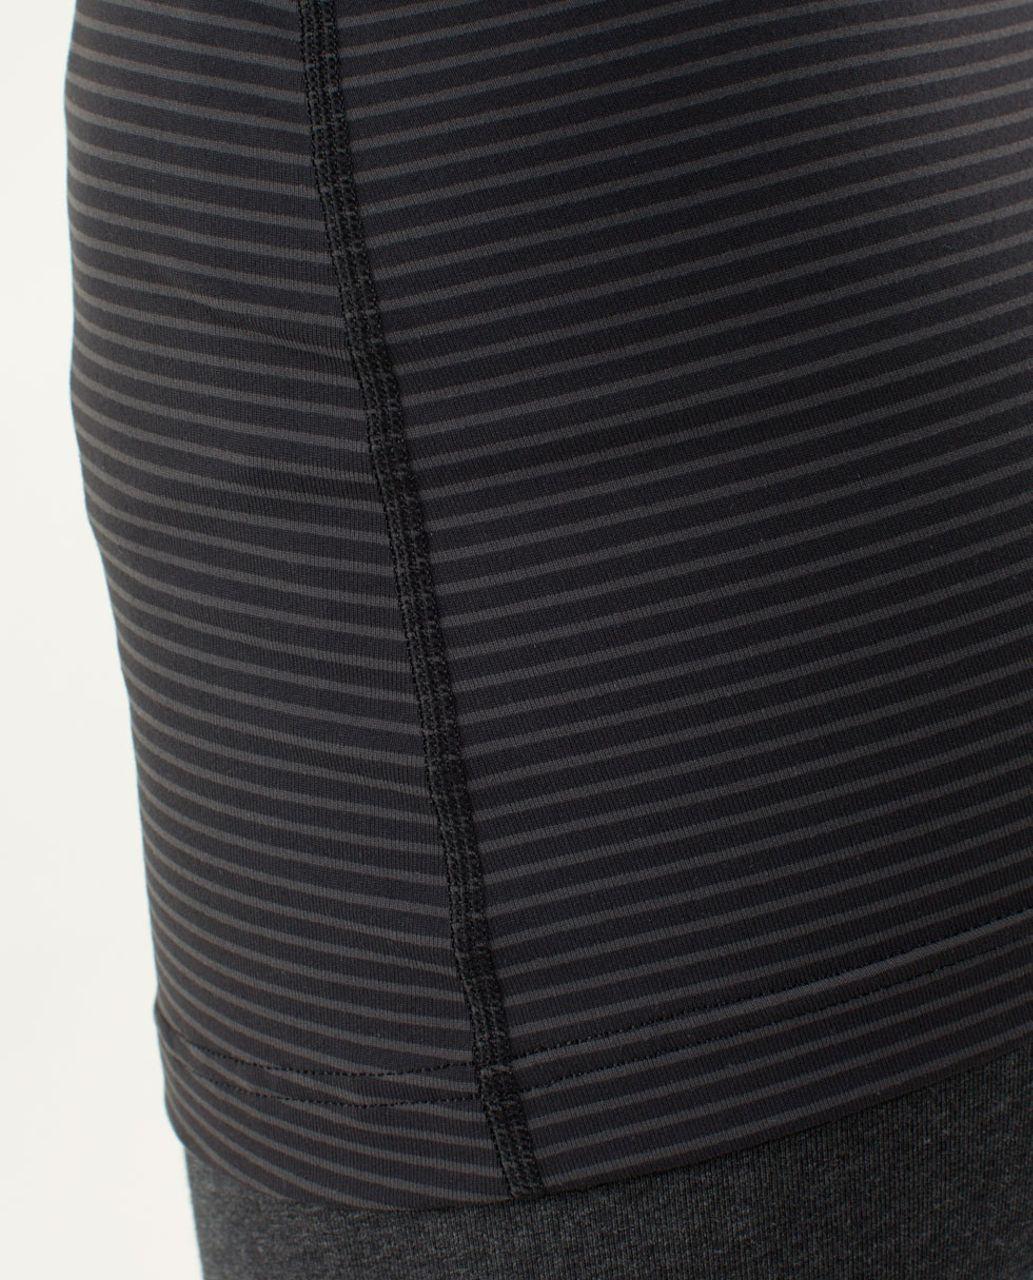 Lululemon Cool Racerback - Hyper Stripe Black